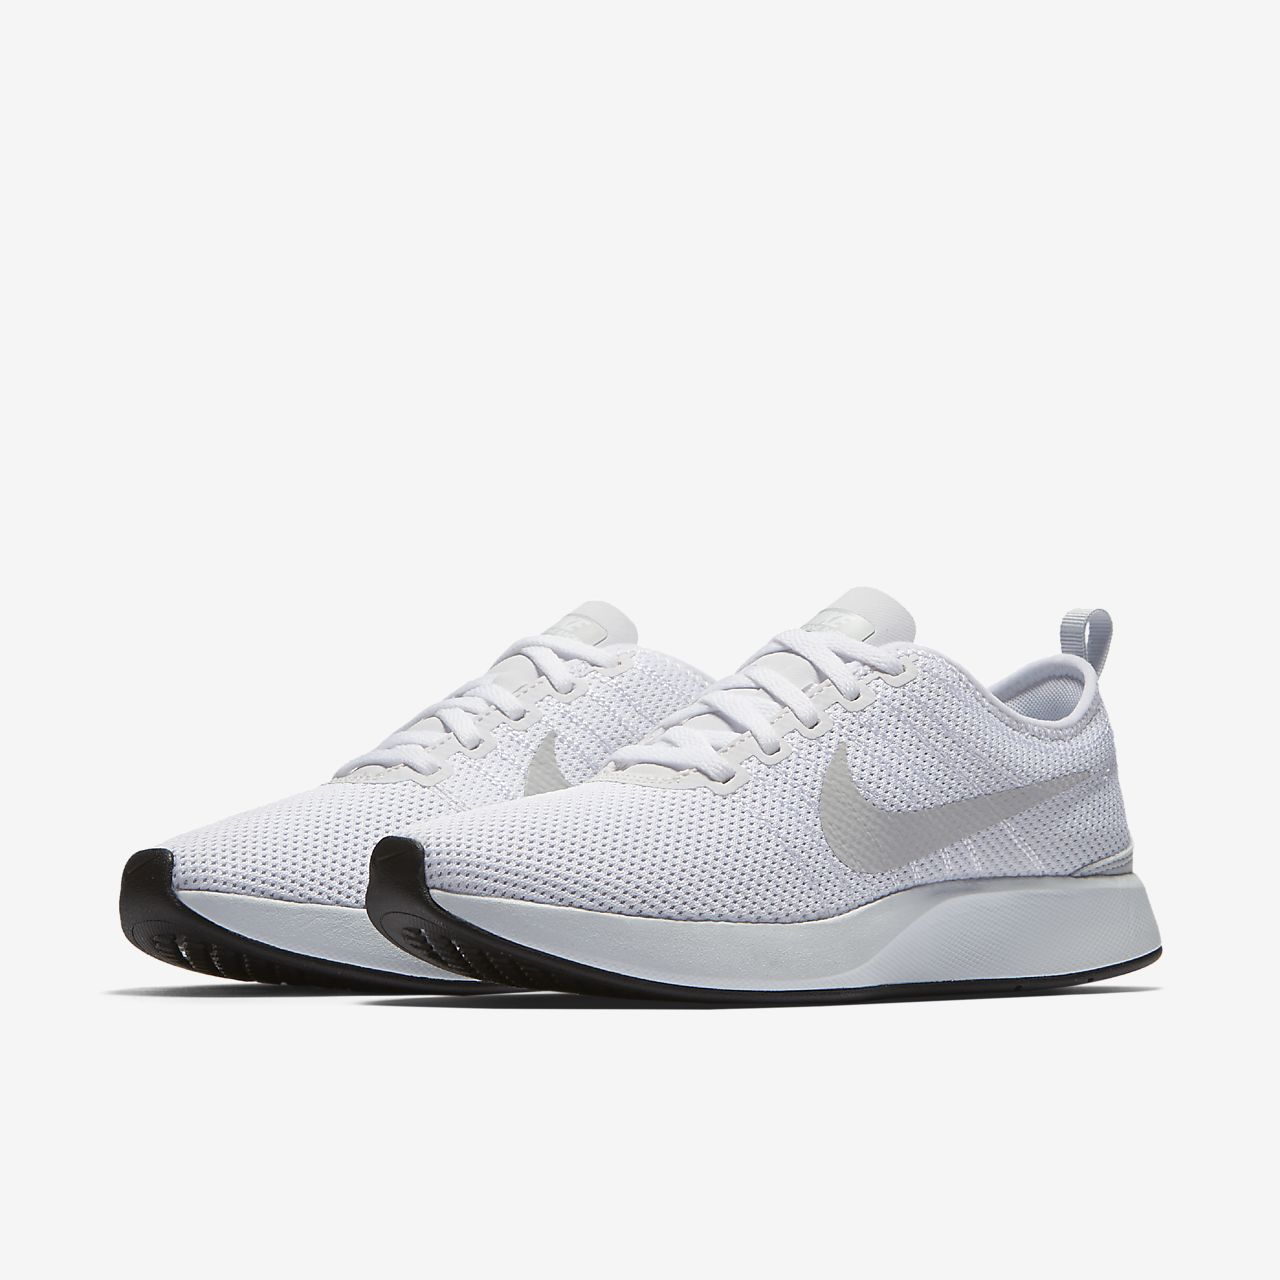 Nike Chaussures Double Racer Ton Blanc AVUNIovzT8